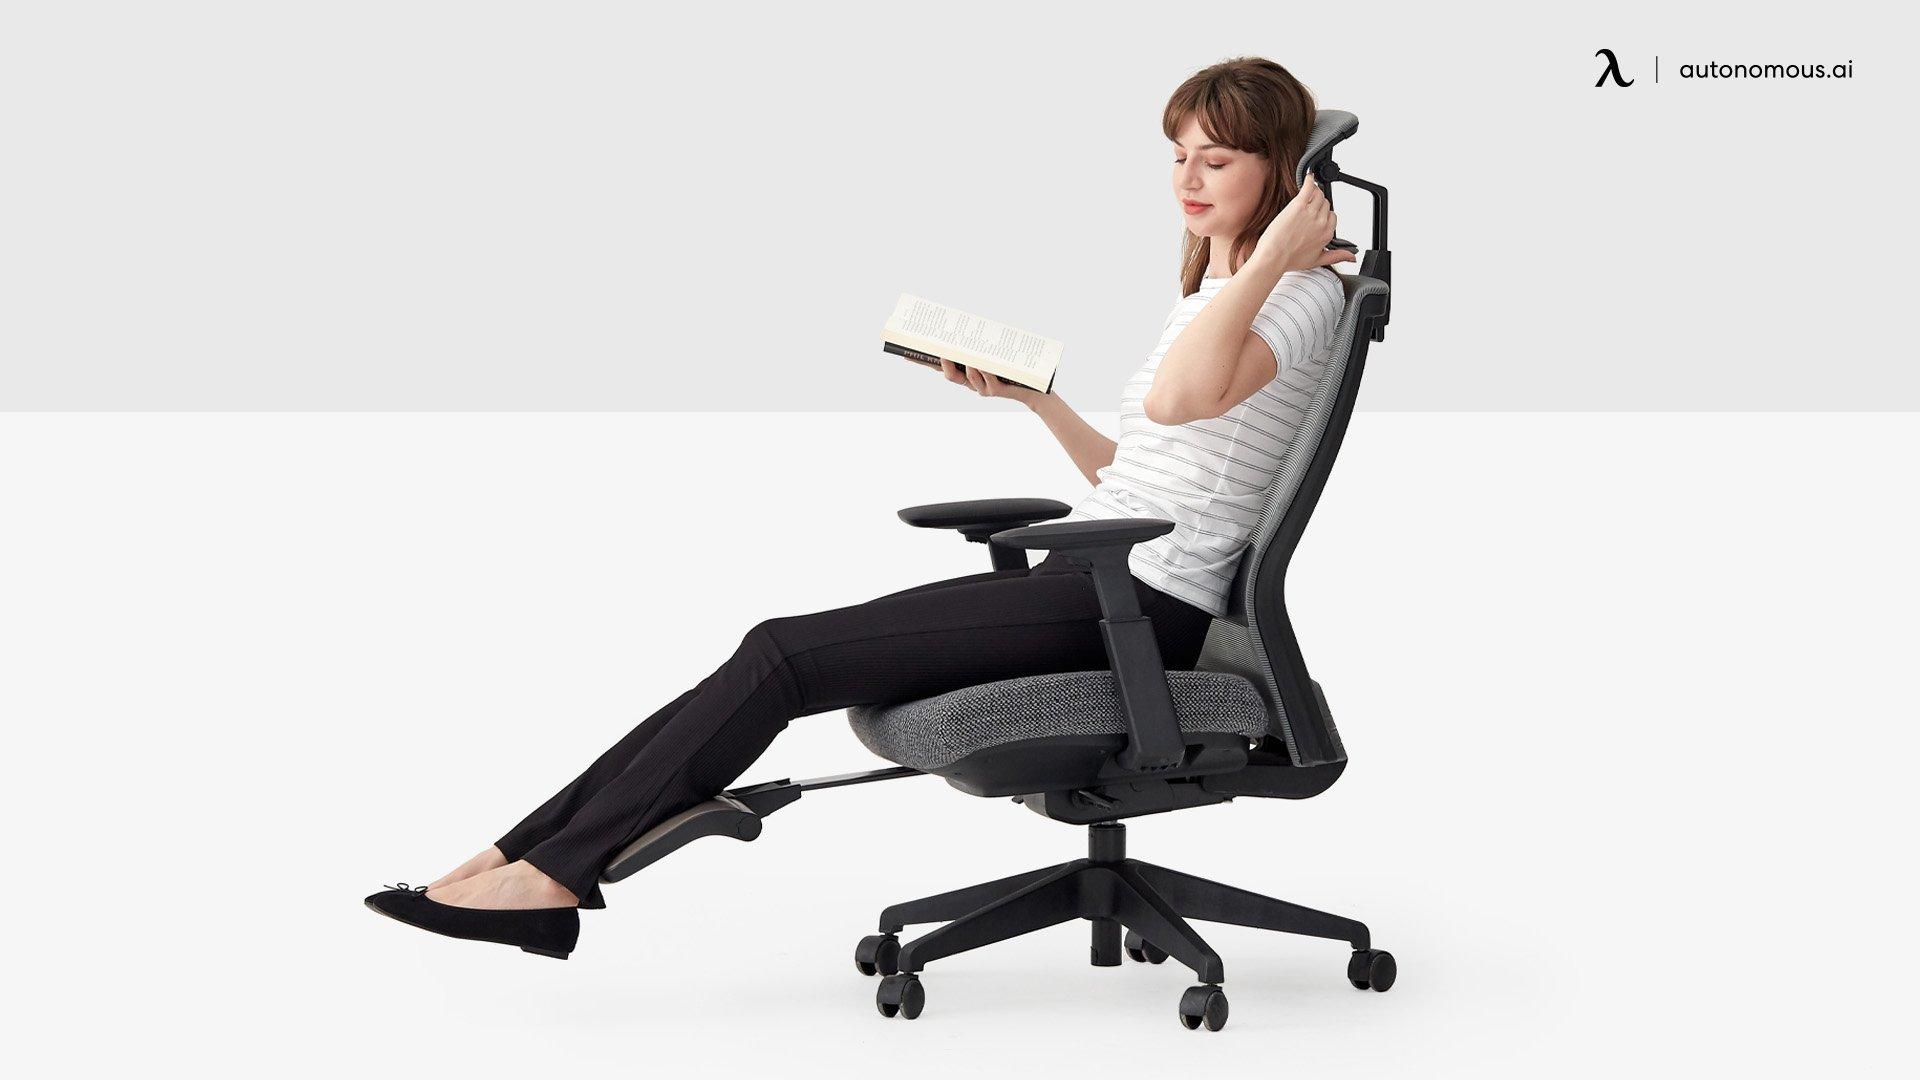 Why choose a high-back chair